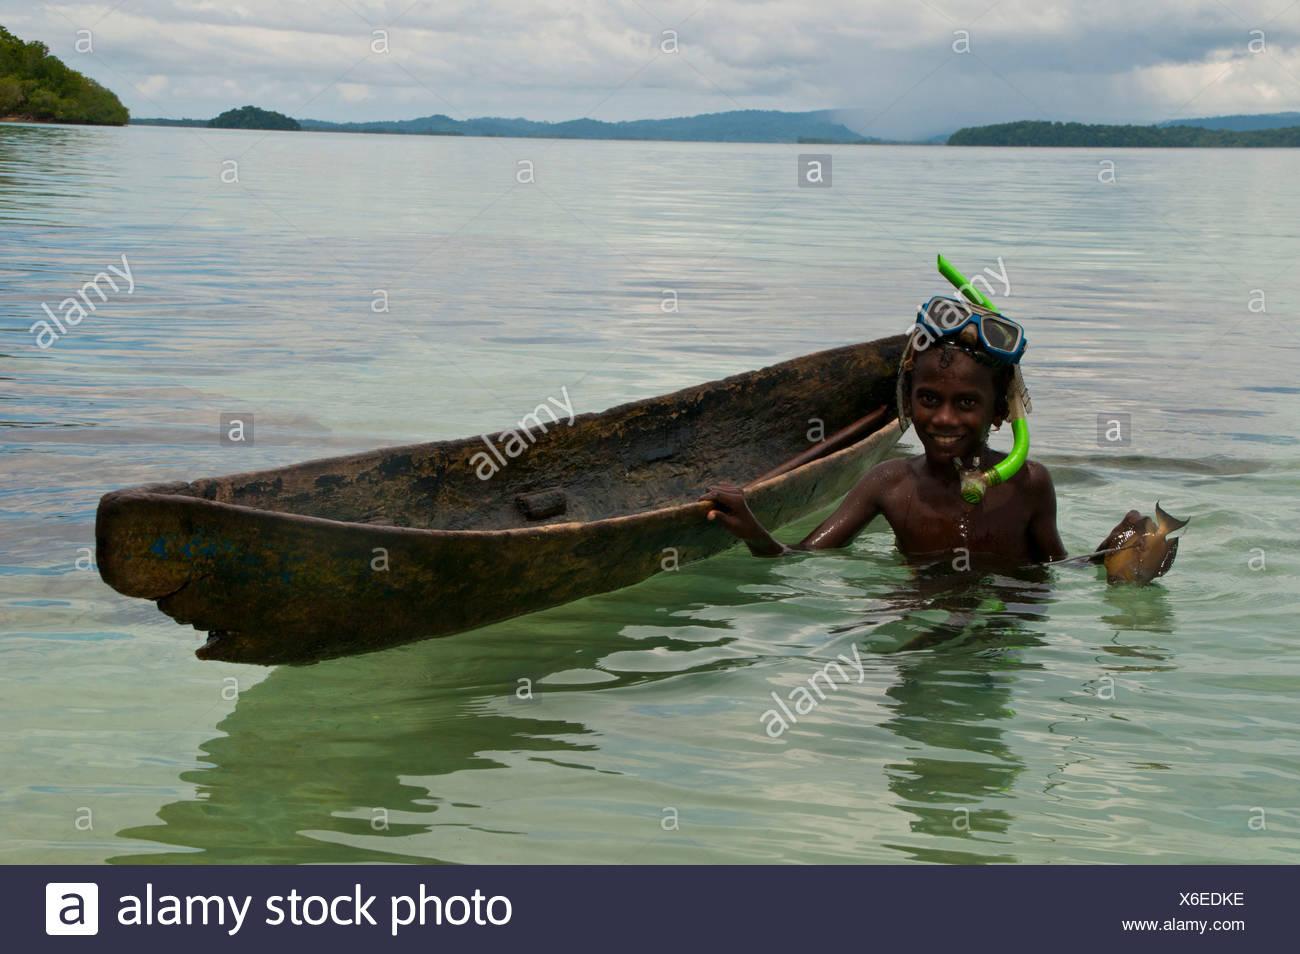 Boy fishing with his canoe and harpoon - Stock Image